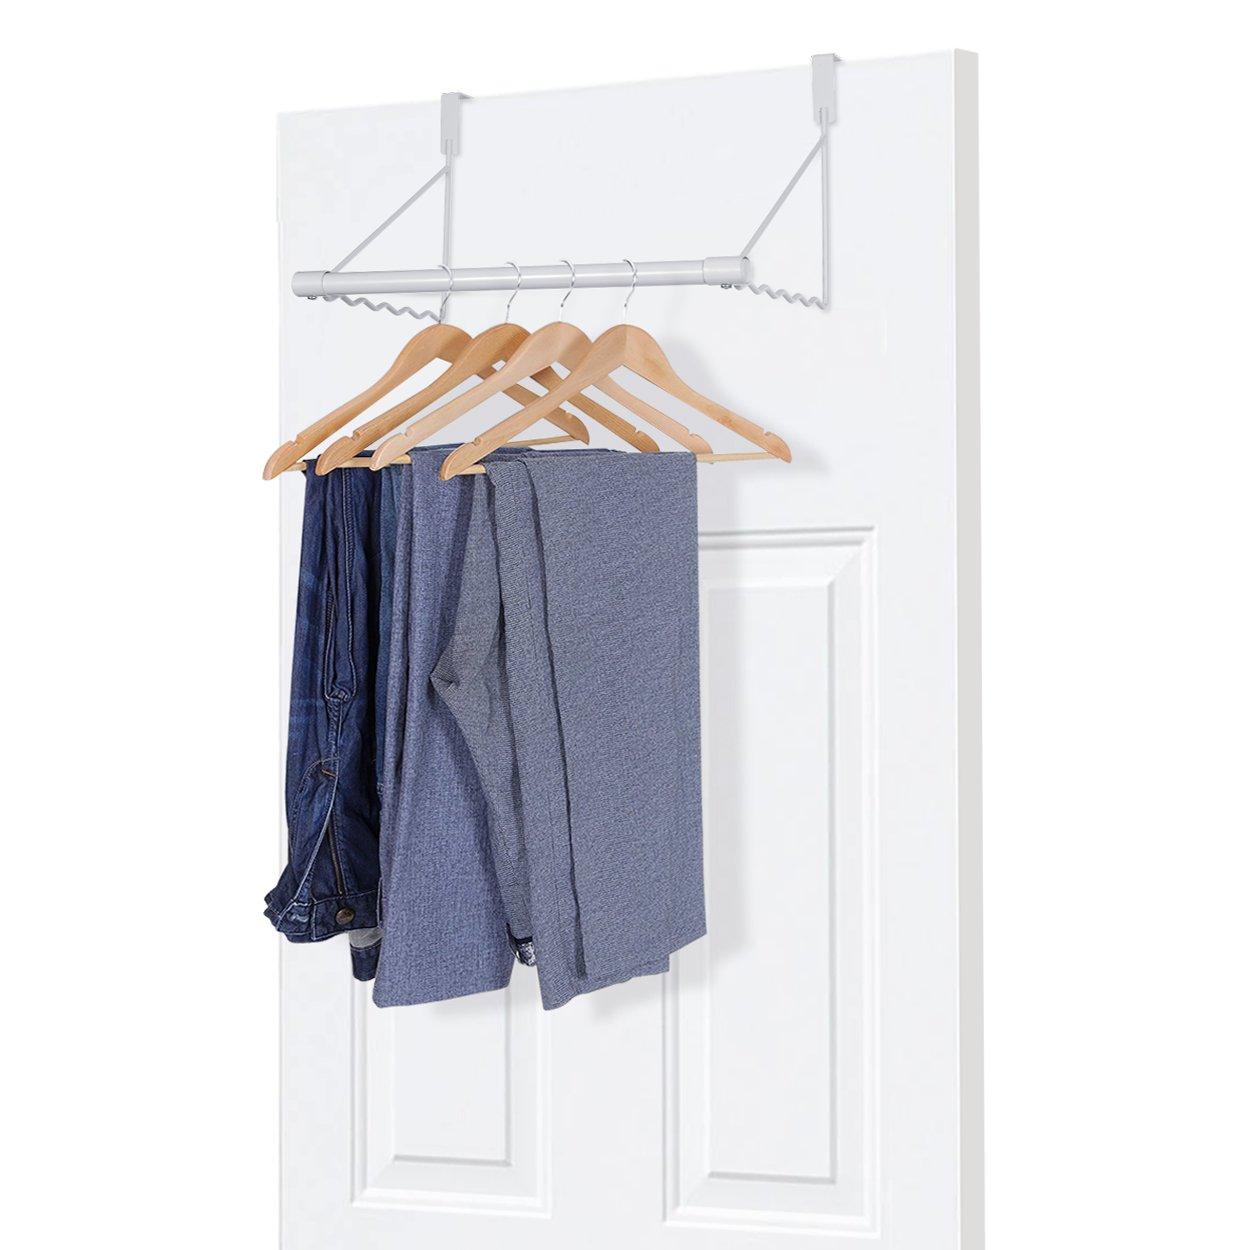 MaidMAX Metal Over The Door Closet Rod Bracket for Clothes Rack Hanger, White